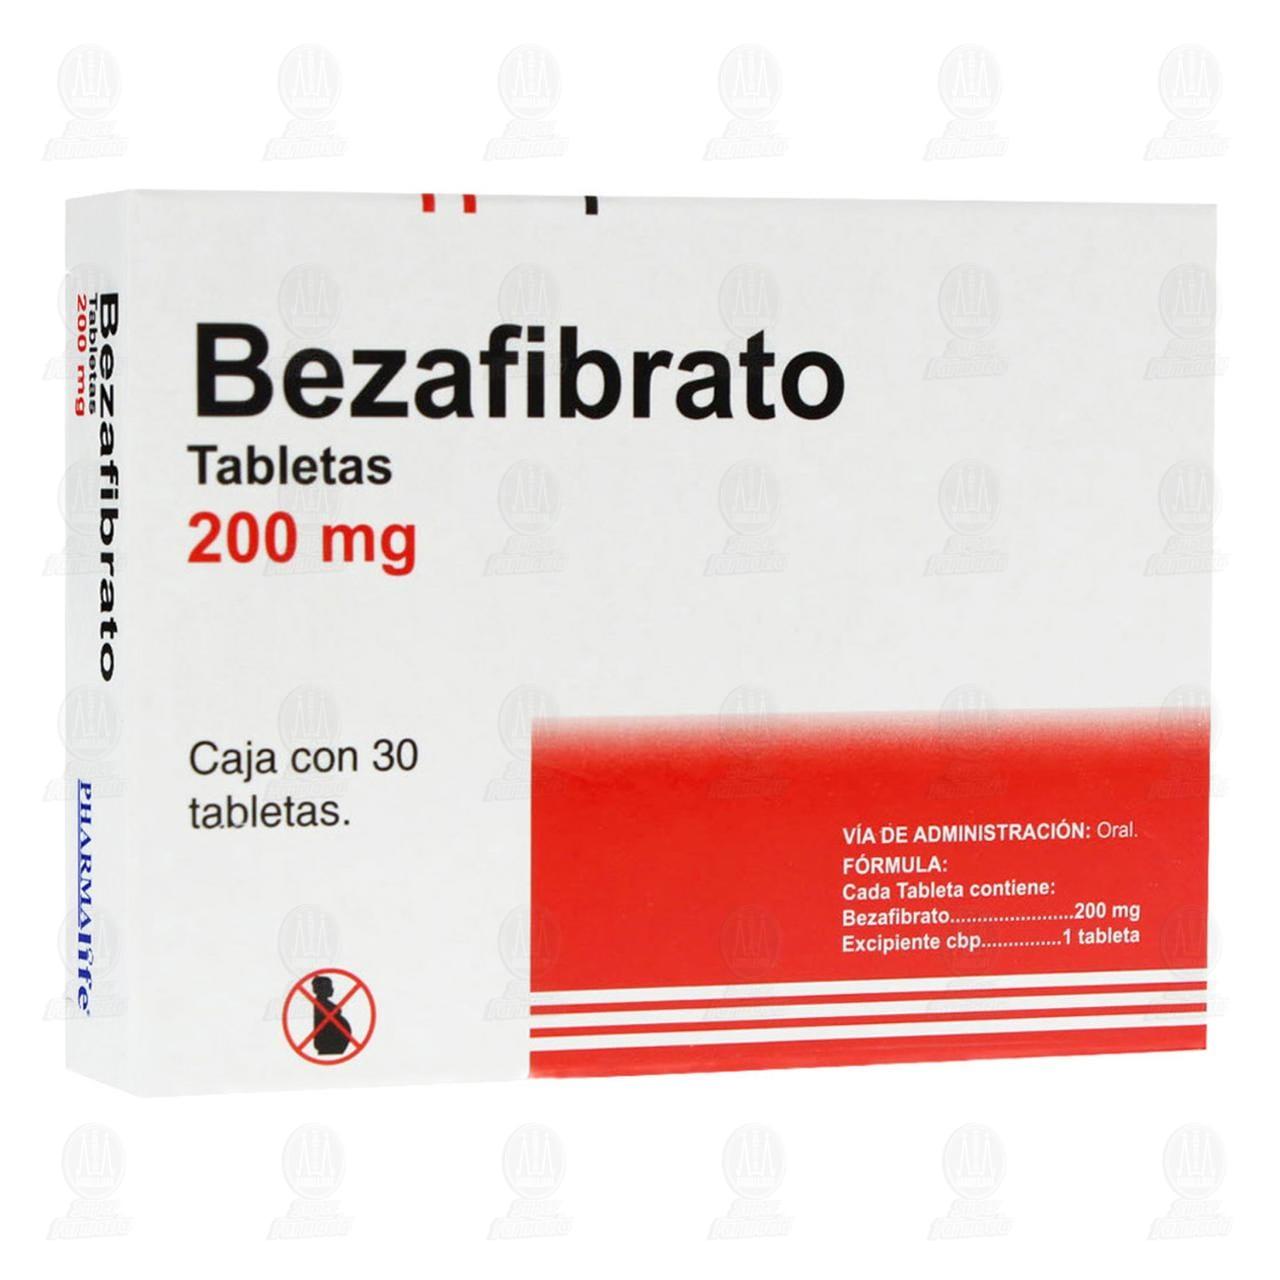 Comprar Bezafibrato 200mg 30 Tabletas Pharmalife en Farmacias Guadalajara